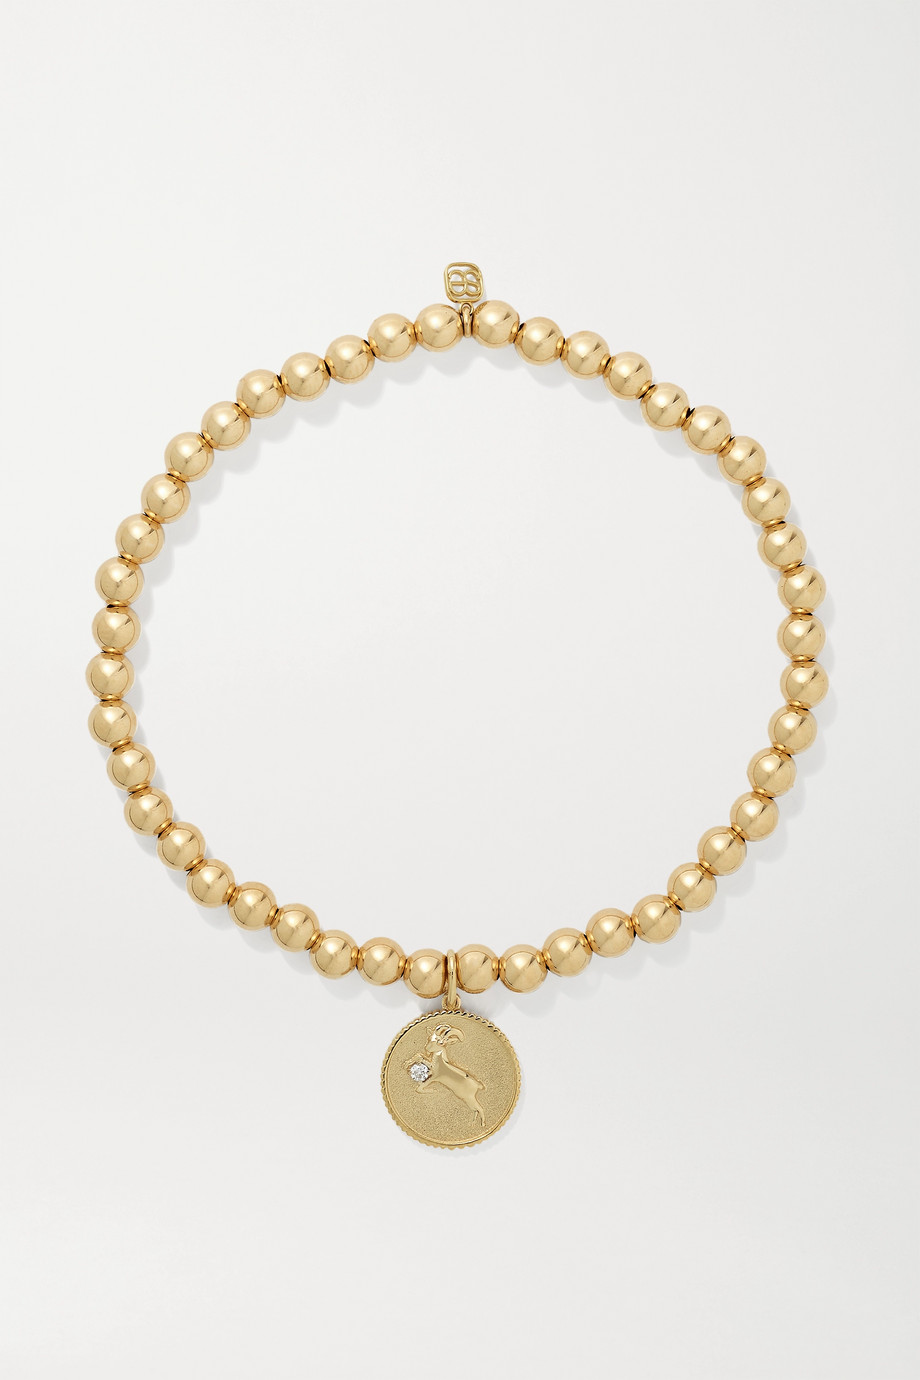 Sydney Evan Capricorn 14-karat gold diamond bracelet